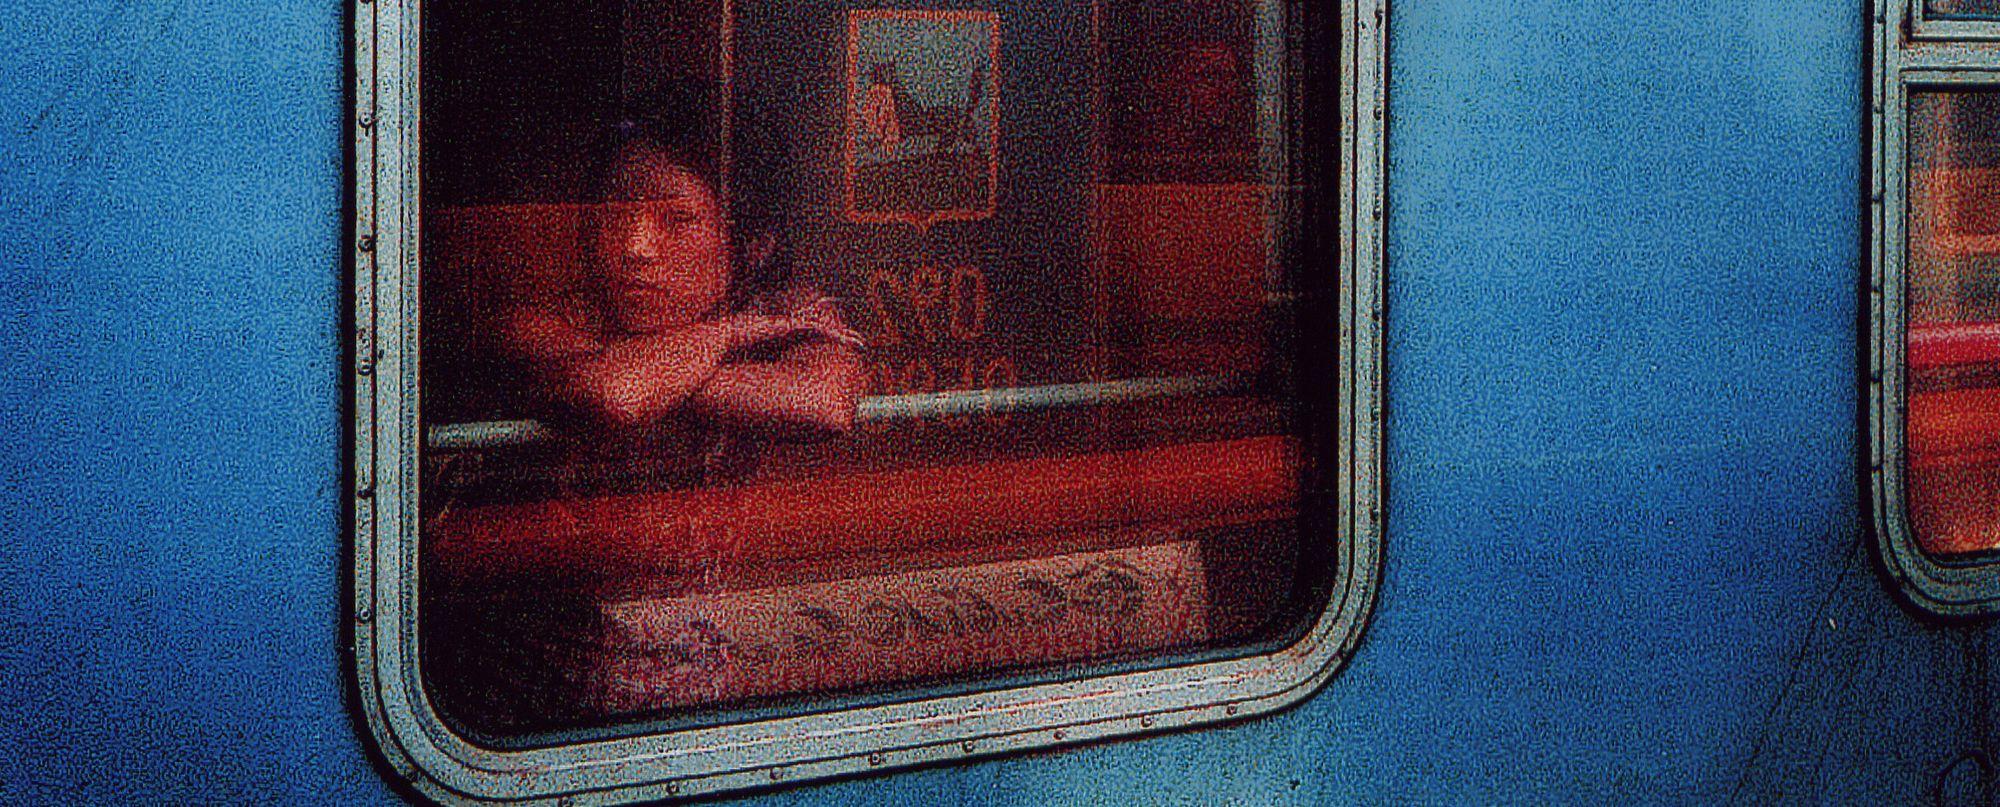 fotos de Rusia autor:Archivo Tuareg